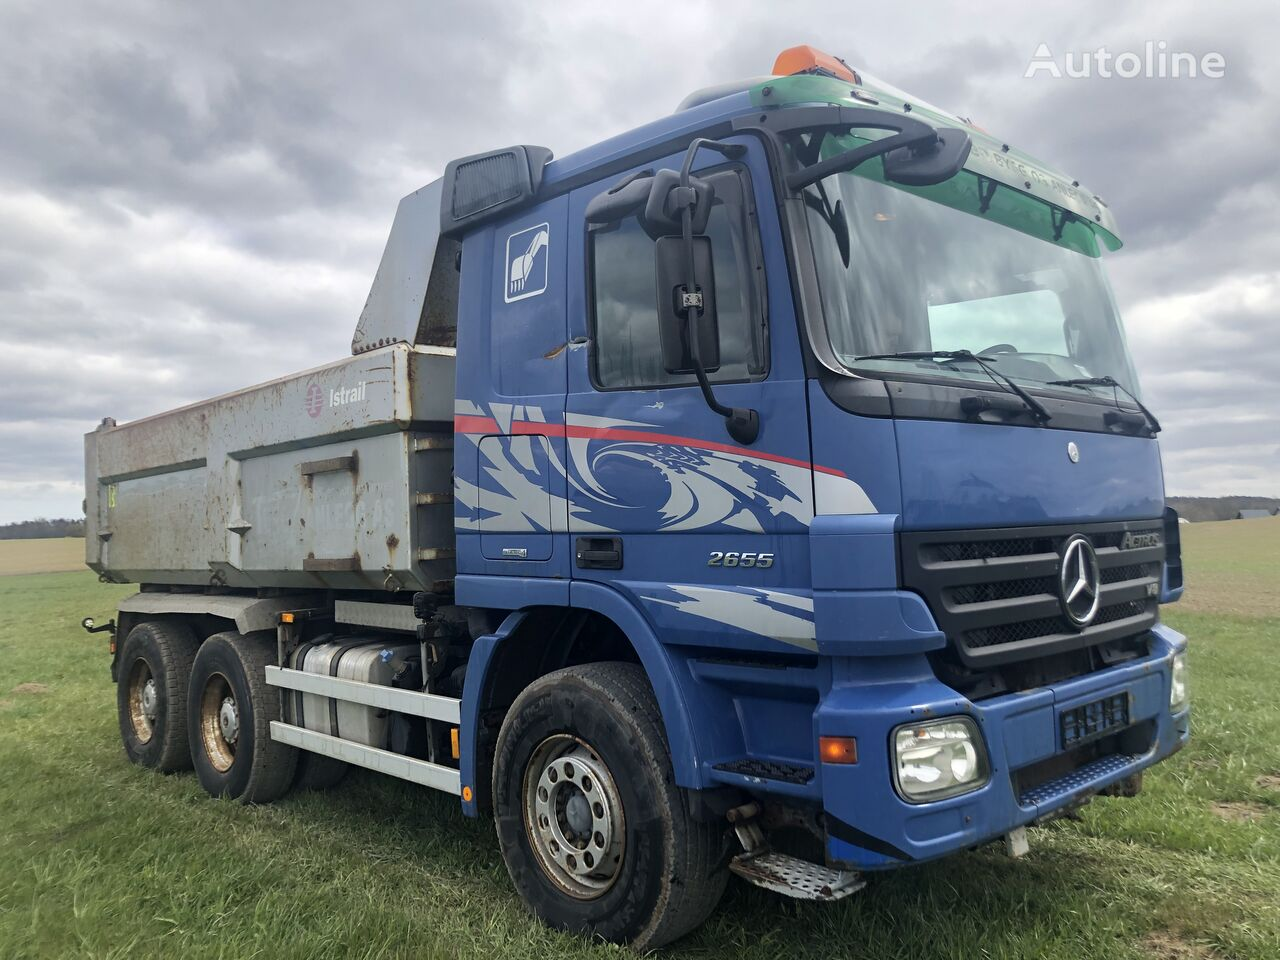 MERCEDES-BENZ Actros 2655 TR.086 dump truck